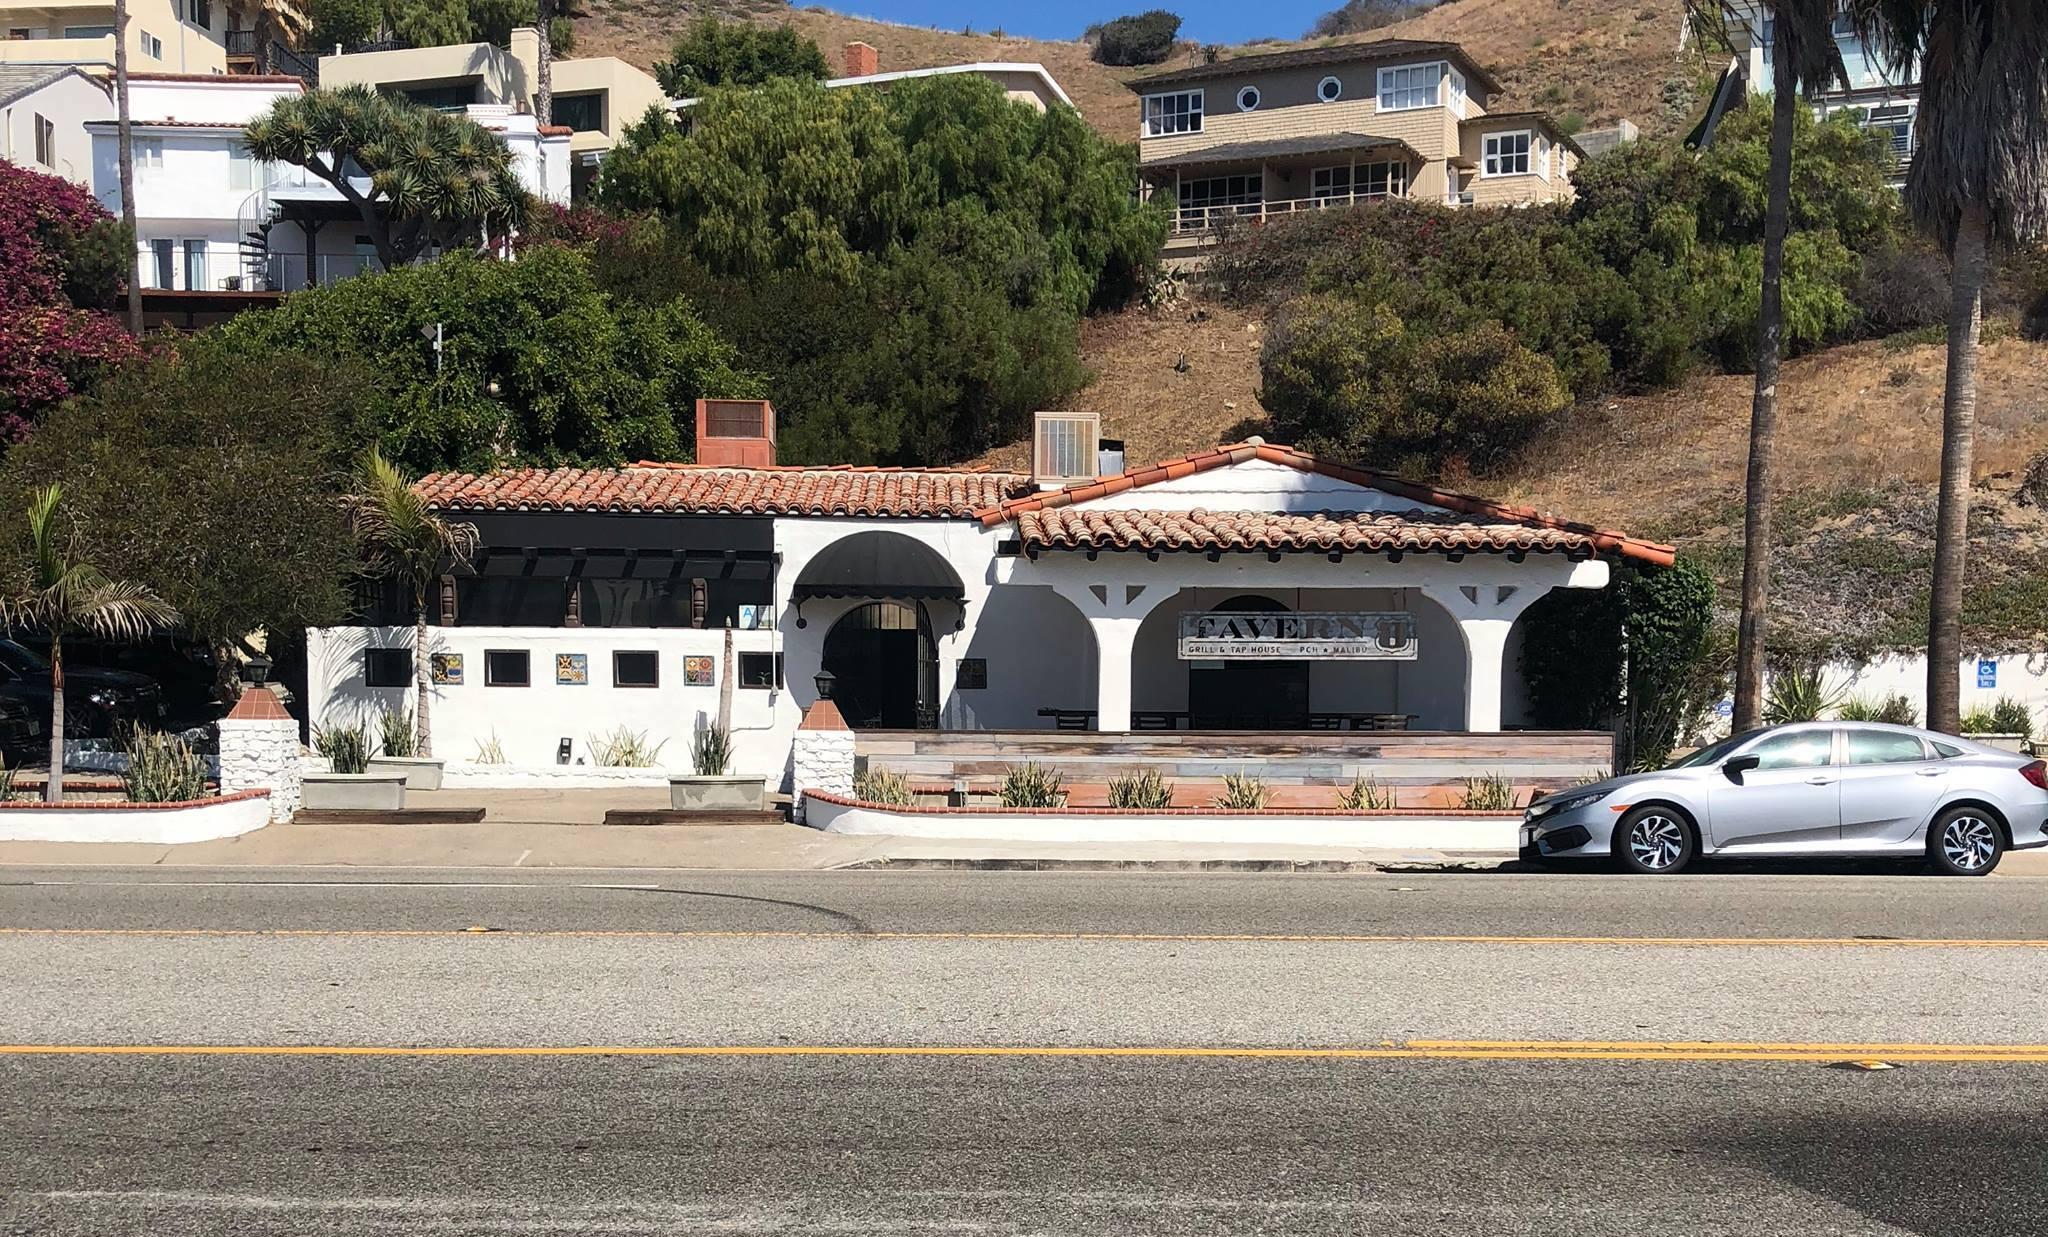 Coastal Malibu Restaurant Will Feature Modern Mexican Fare Along PCH